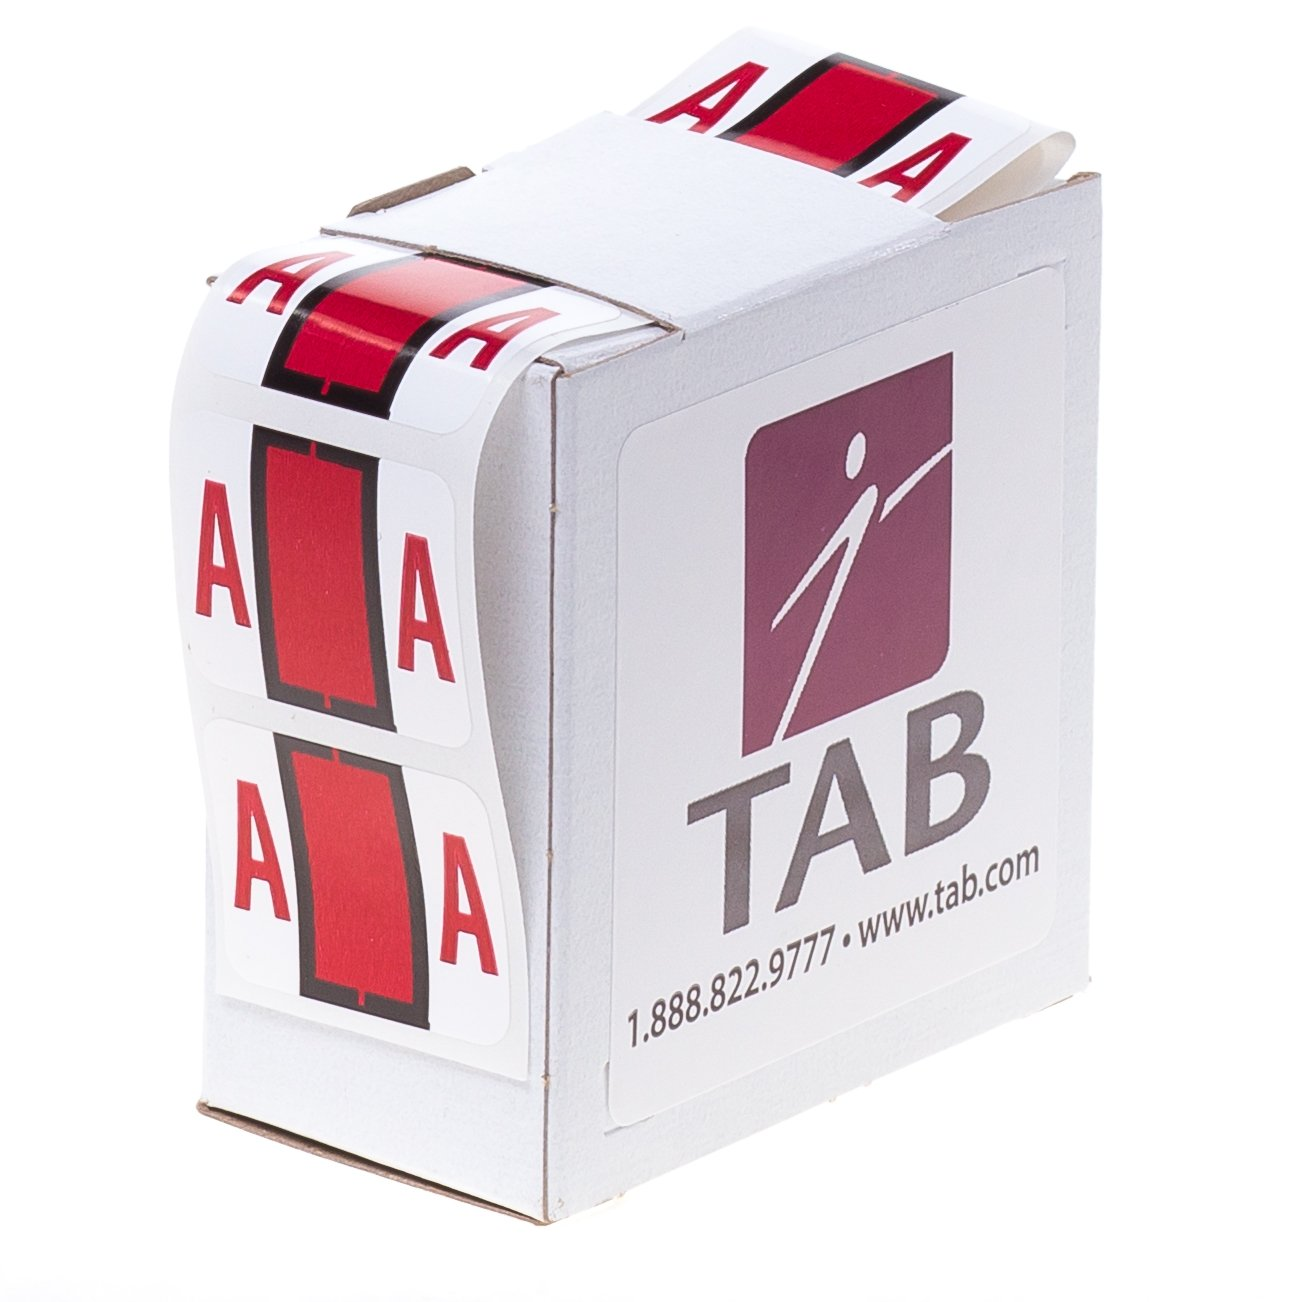 TAB Alphabetic Folder Label Roll 1 E Dark Green 500 Labels//Roll